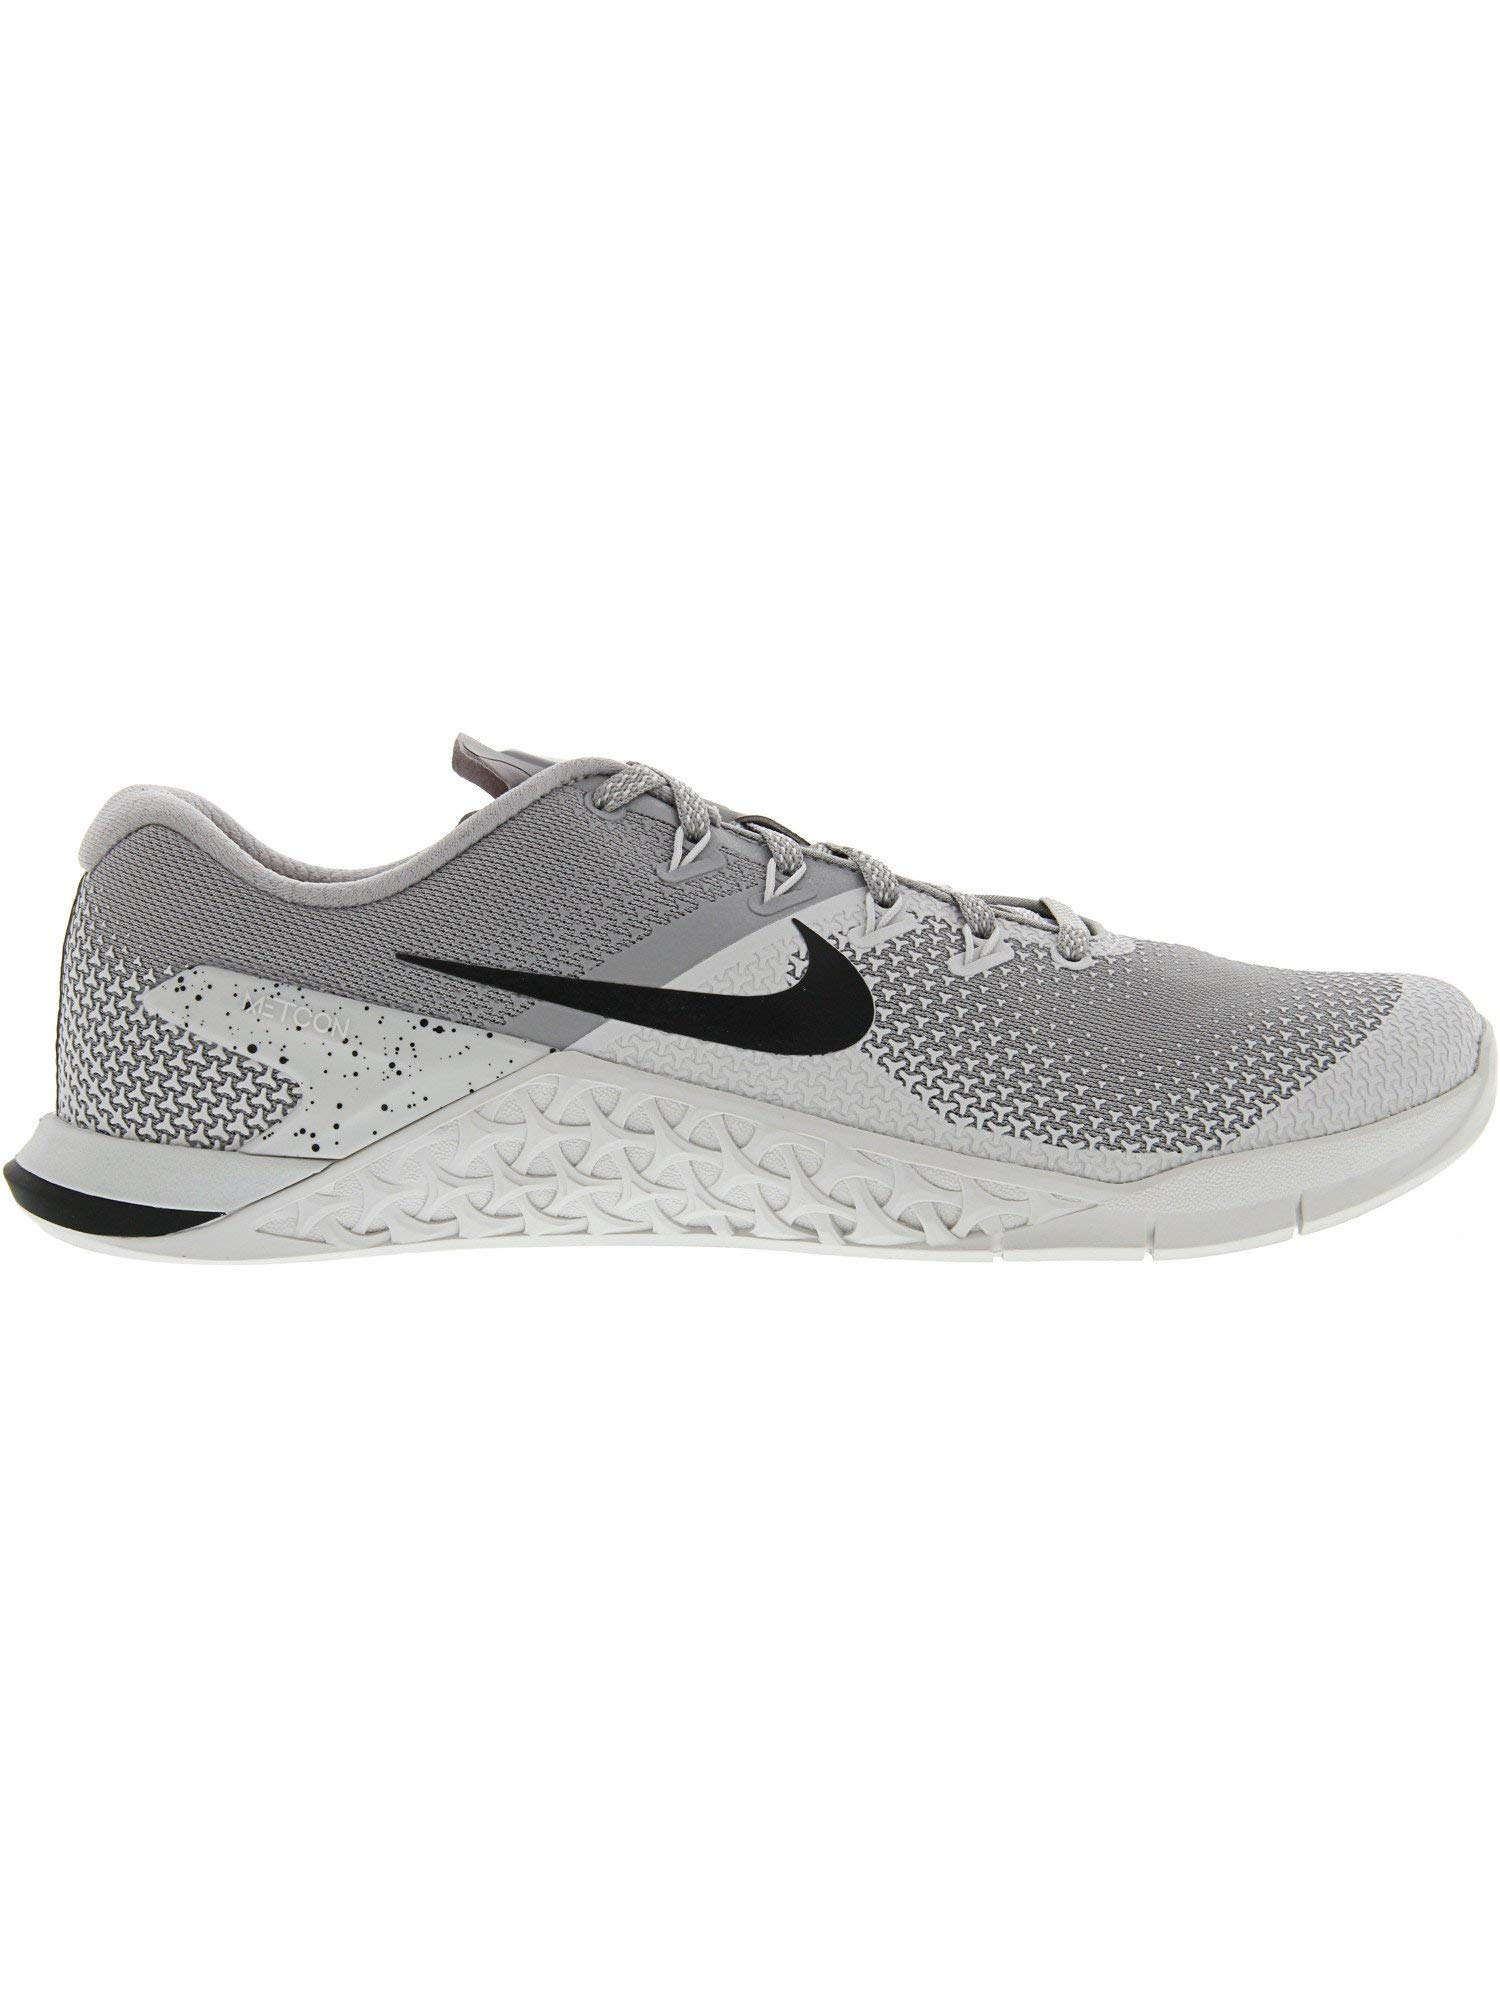 Nike Men's Metcon 4 Atmosphere Grey/Black Ankle-High Cross Trainer Shoe - 7M by Nike (Image #4)